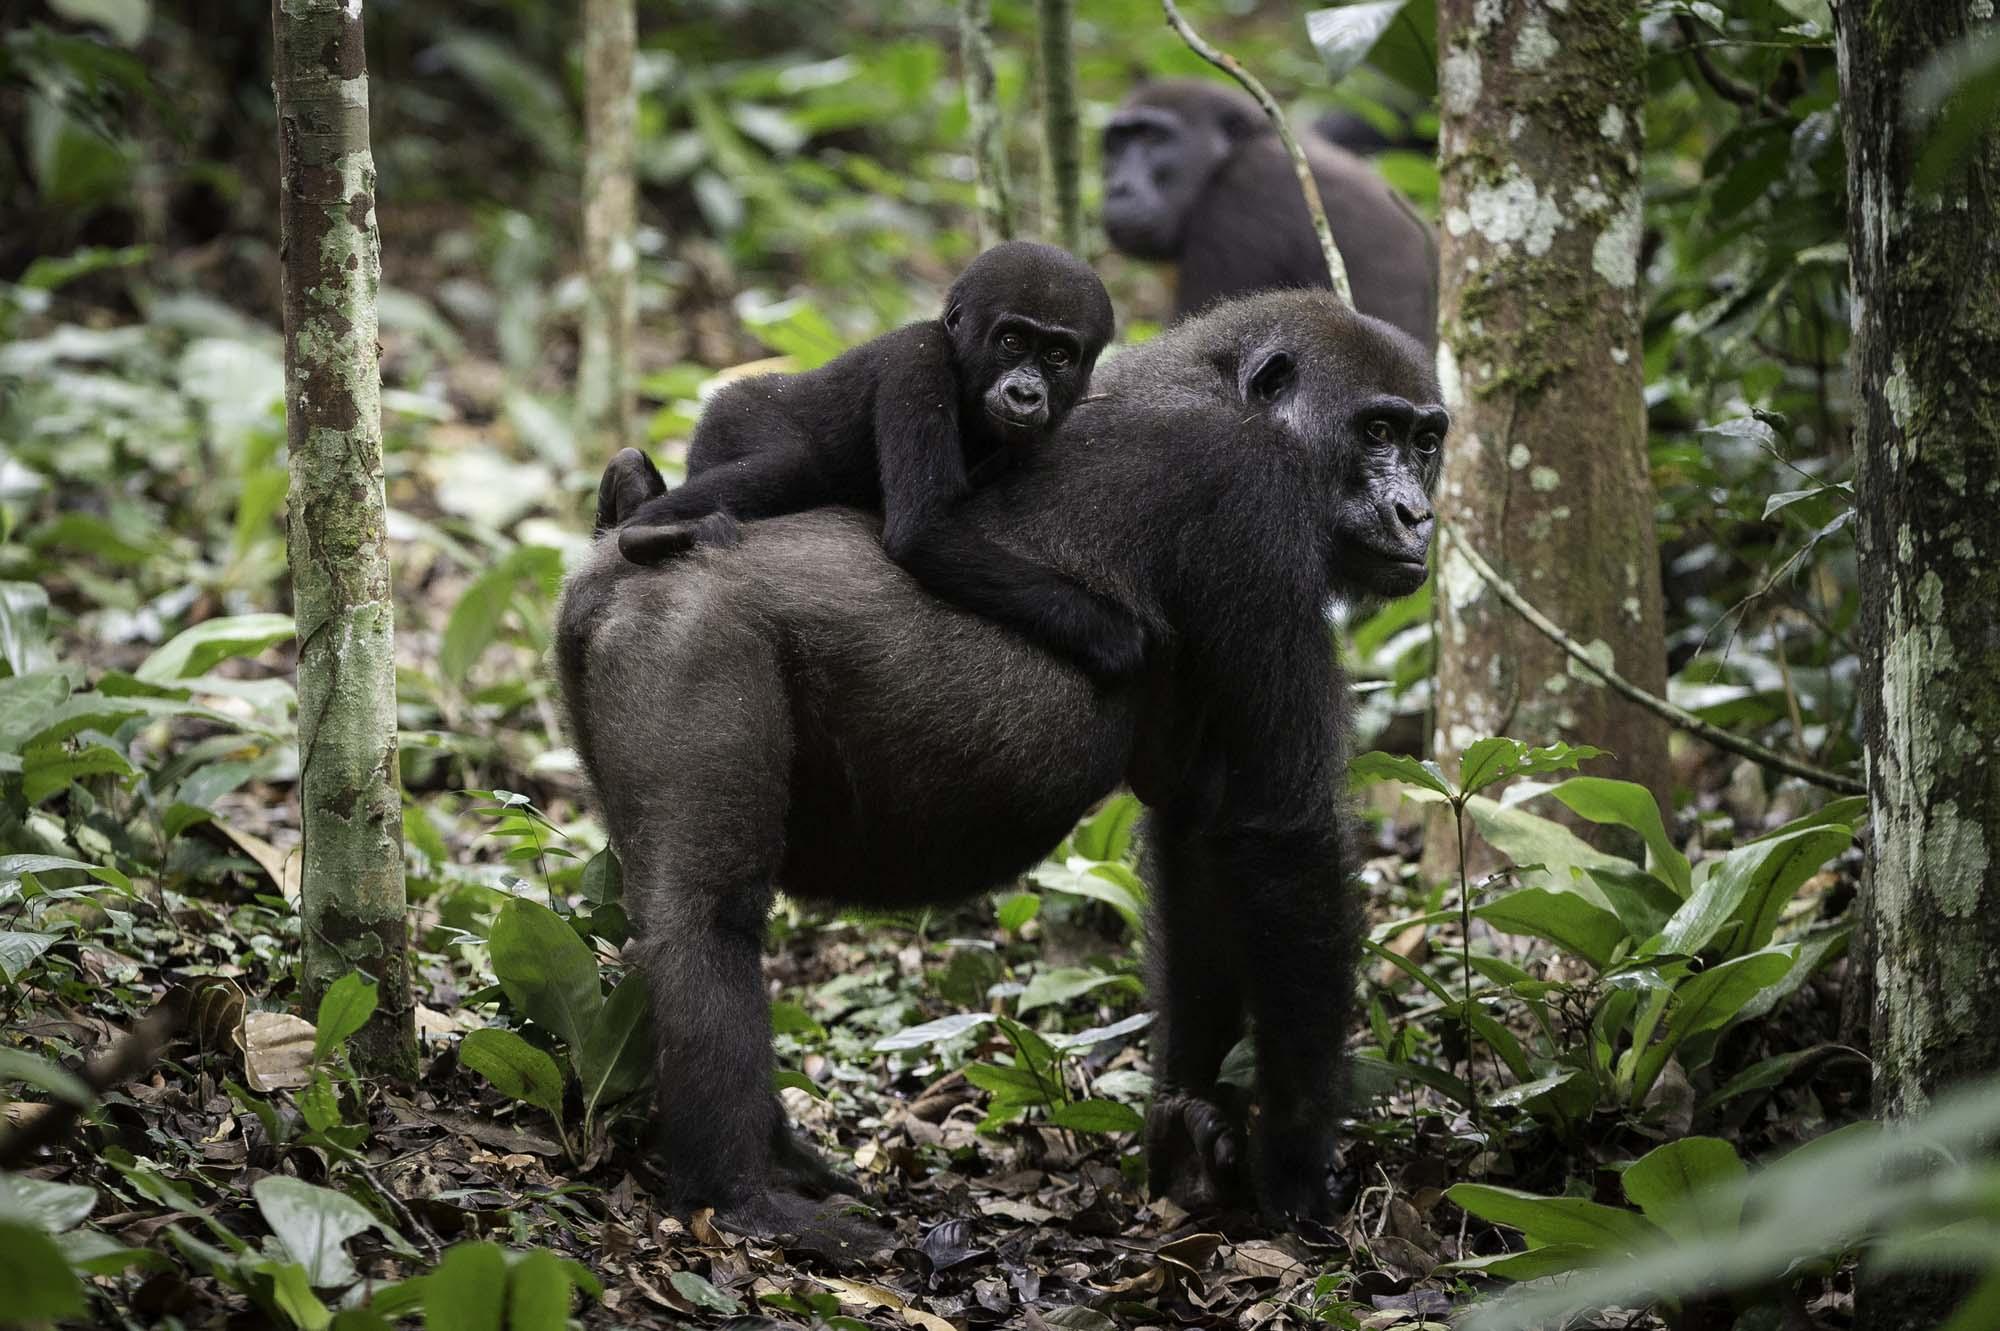 Gorillas in Africa,Travel Africa, Africa Safari Guide, Luxury African Safari